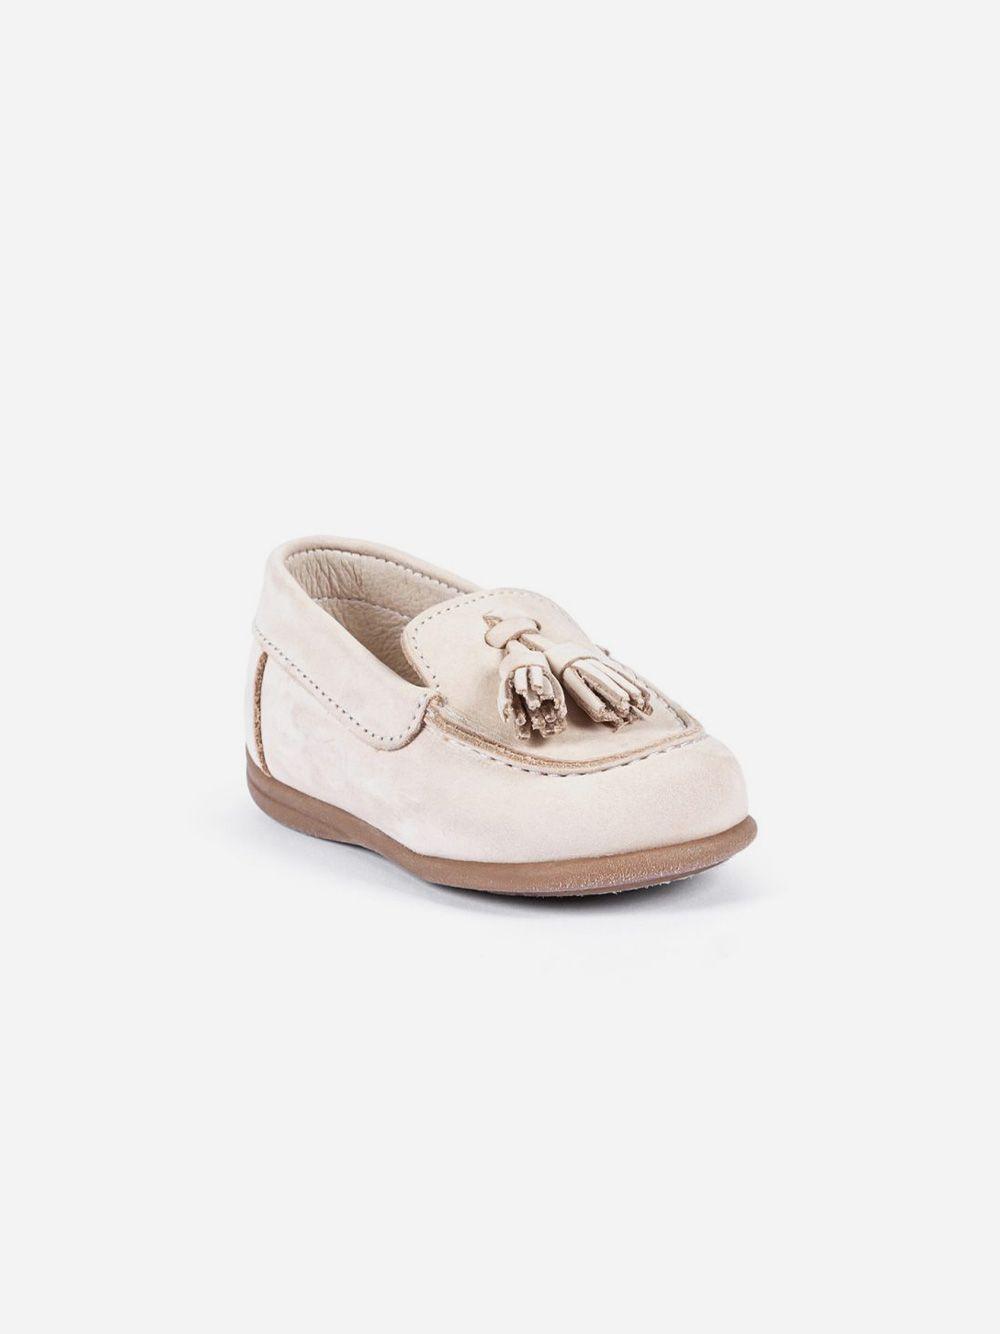 Sapatos Beges L. Thomas | Pikitri